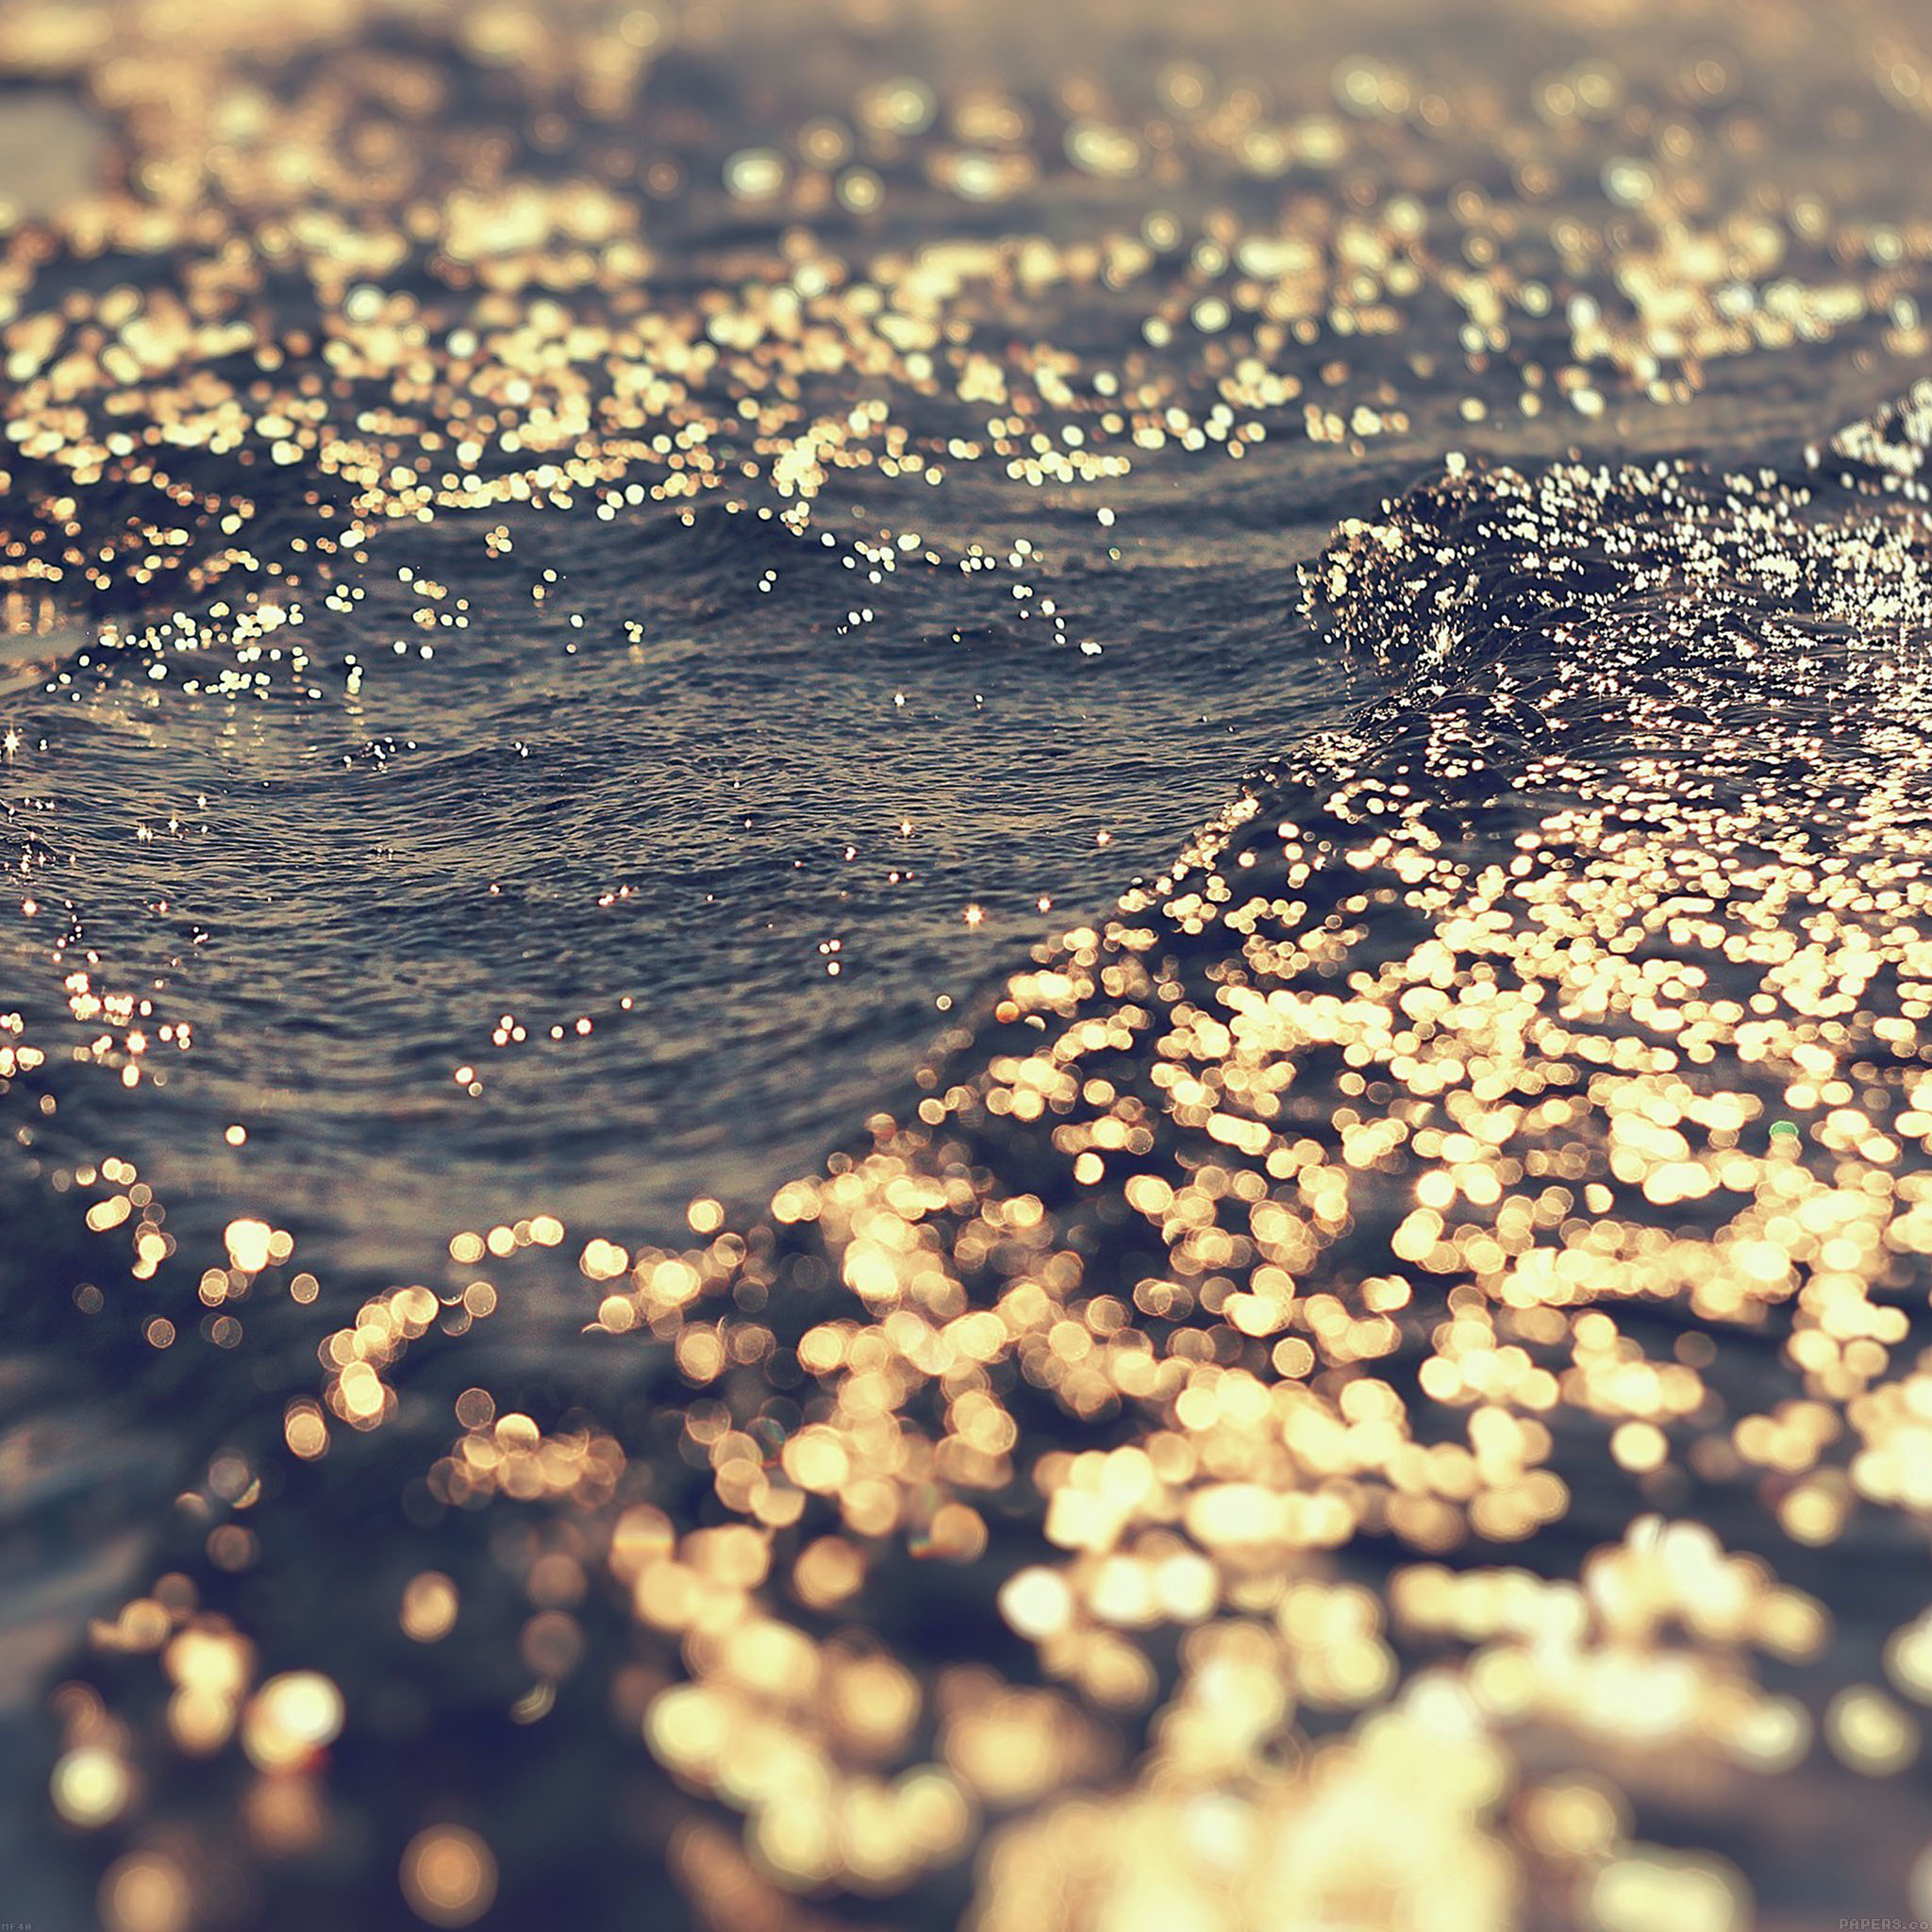 Mf40-gold-sea-water-sunset-ocean